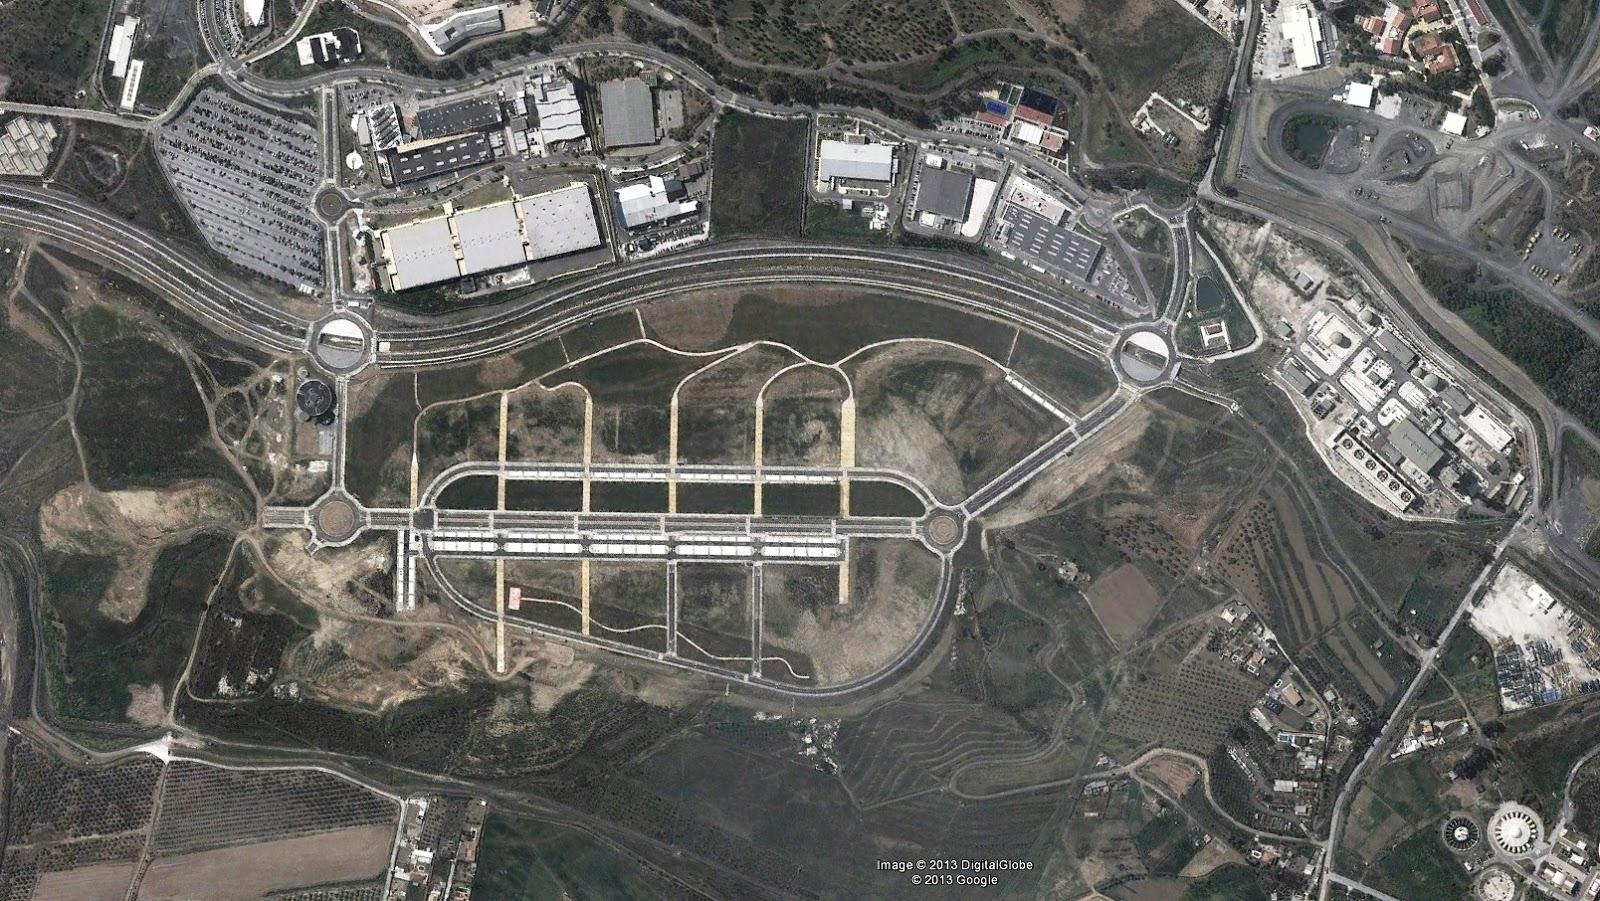 Arquitectespelpaisatge miguel lvarez naci n rotonda el paisaje de la burbuja inmobiliaria - Fotografia aerea malaga ...